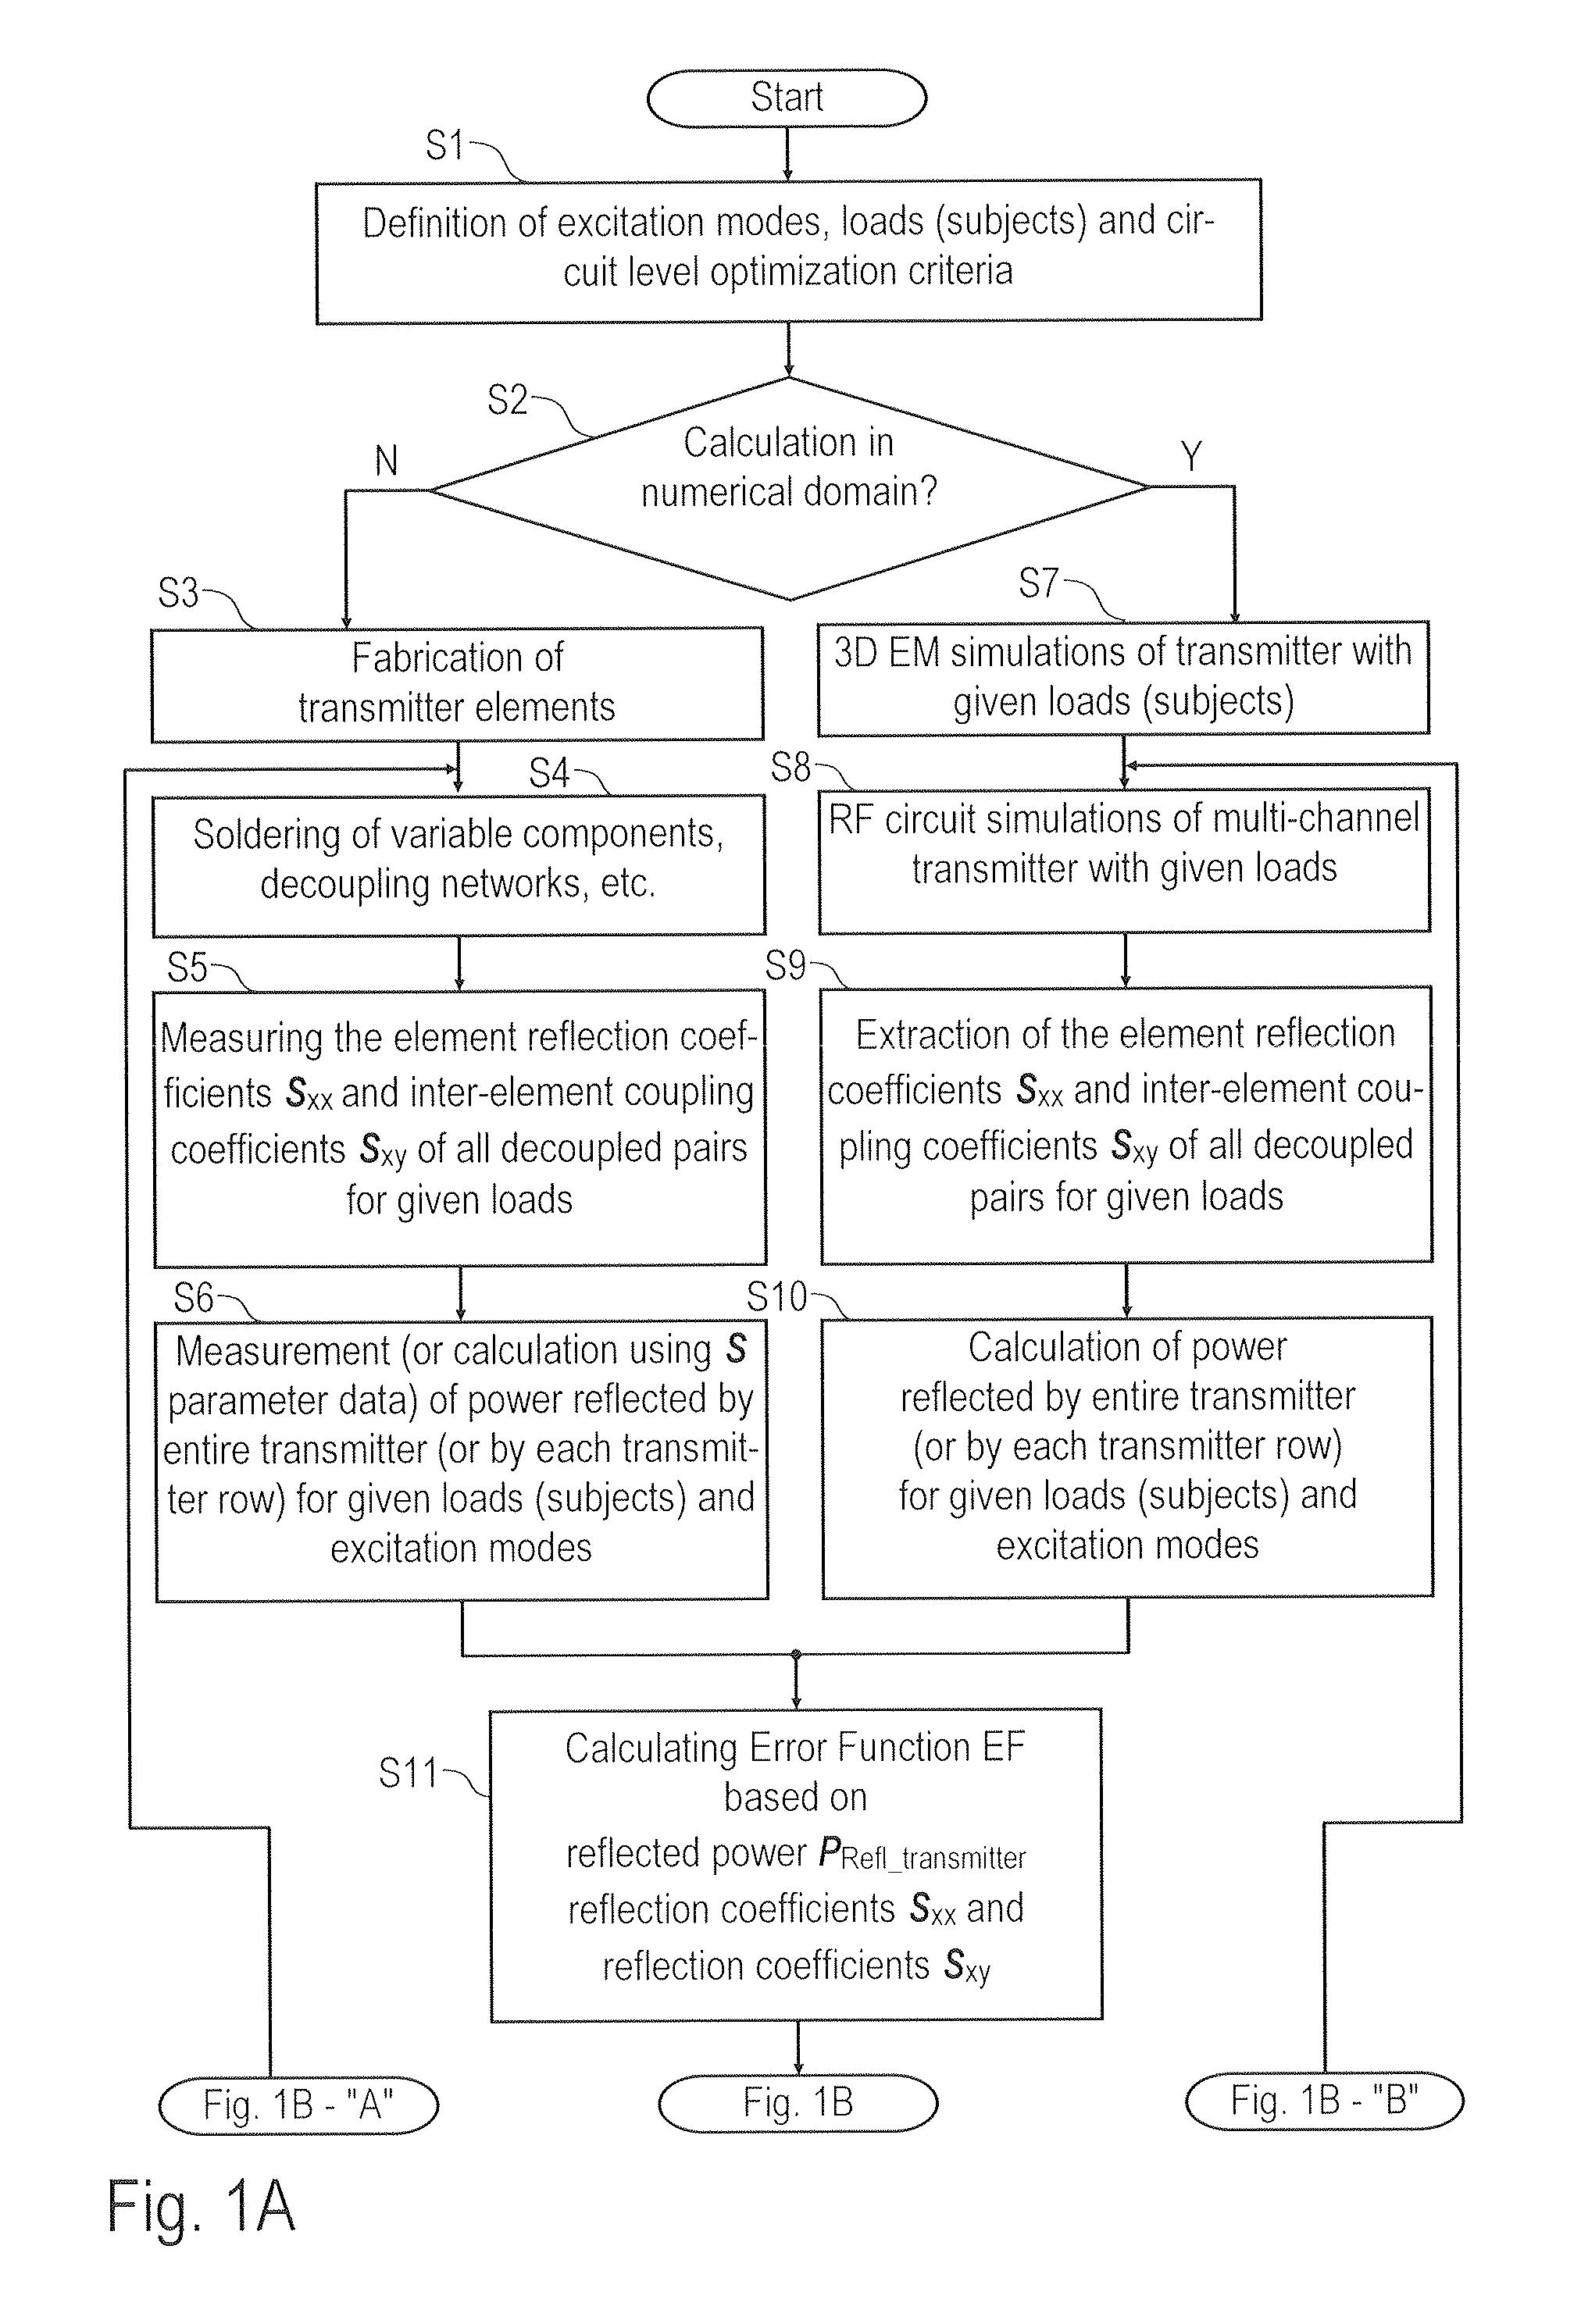 Patent US 9,841,477 B2